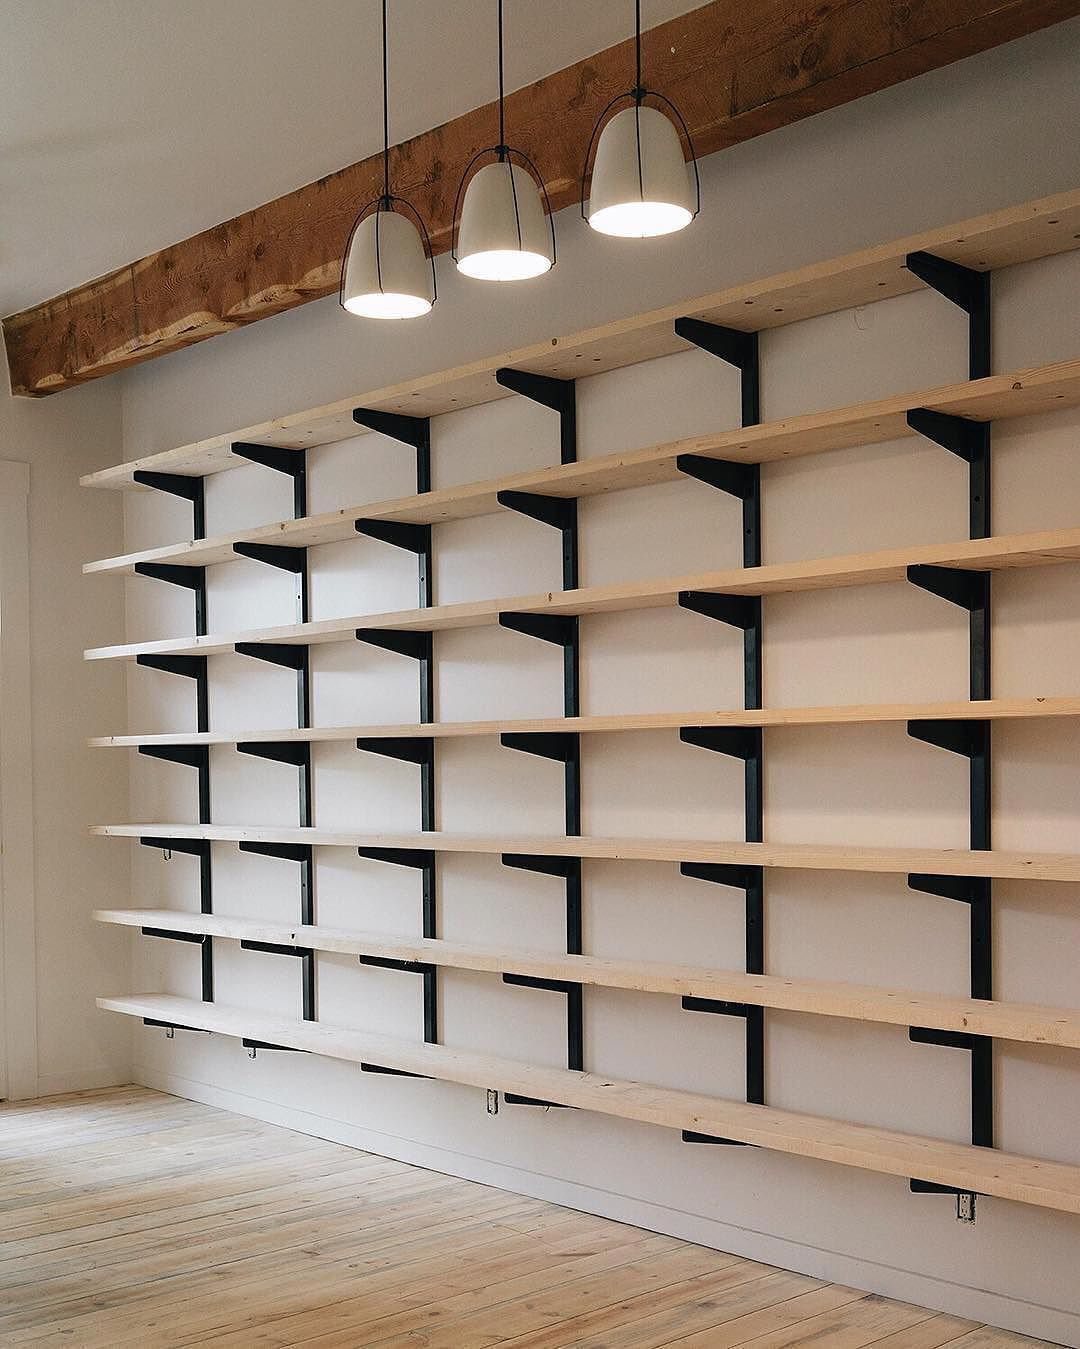 Creative hacks to organize your stuff for garage storage 34